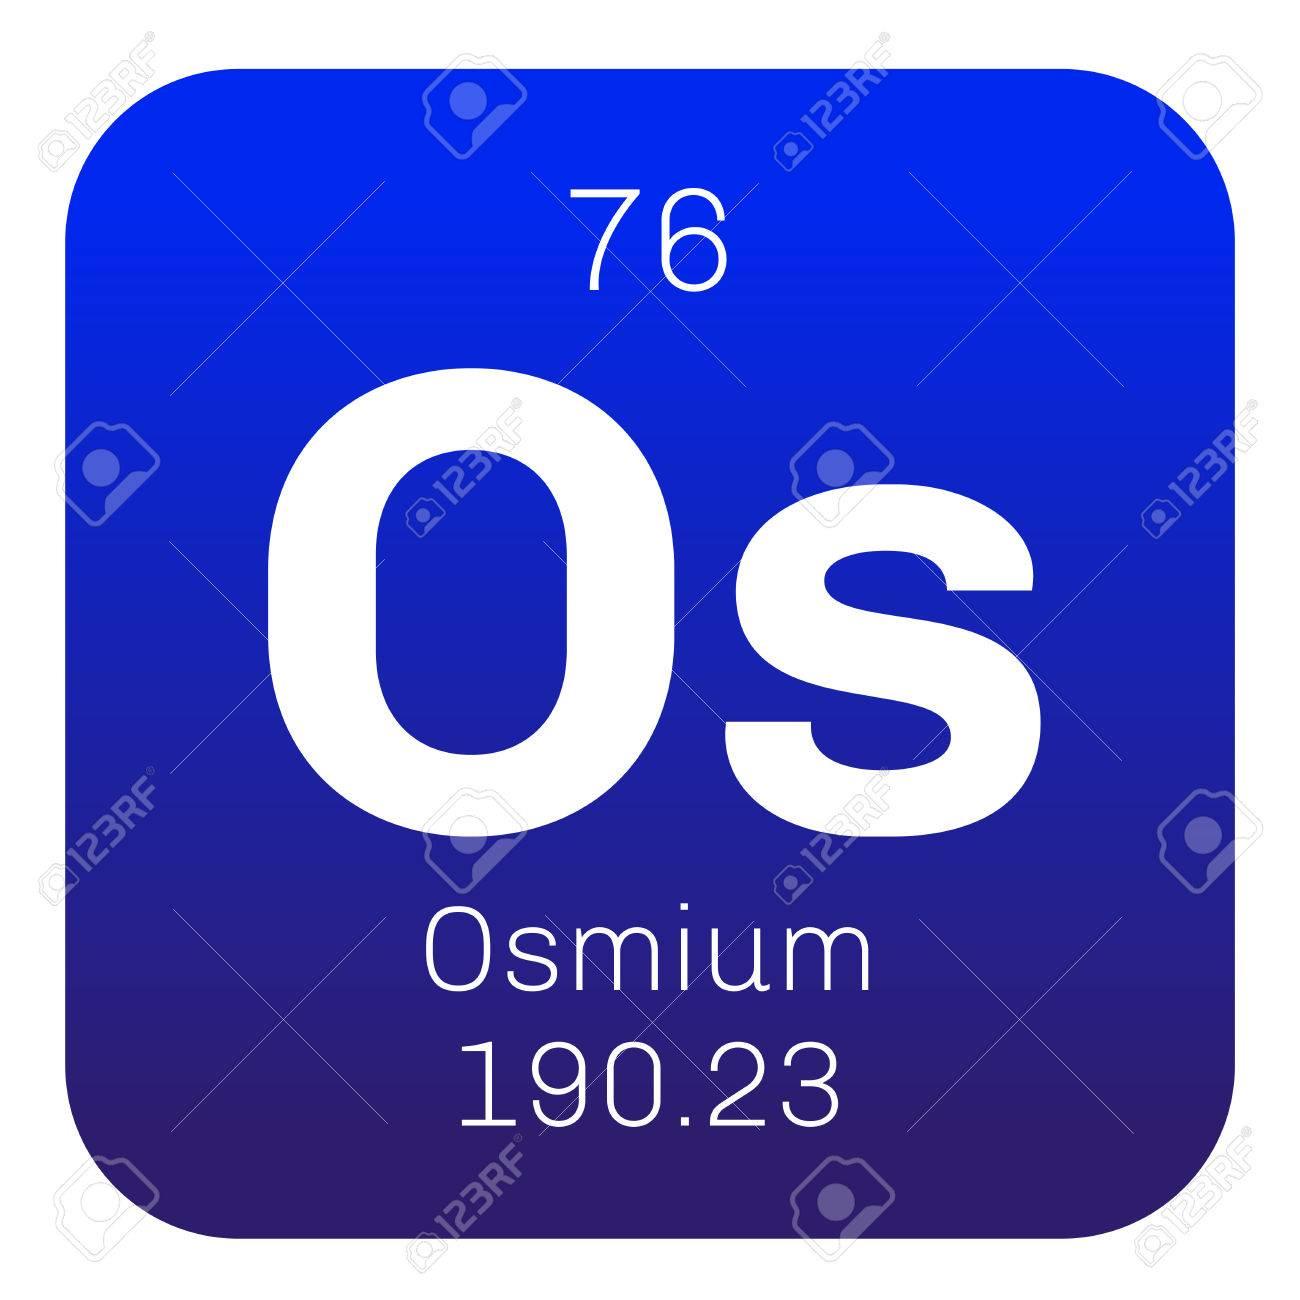 Osmium chemical element osmium is the densest naturally occurring osmium chemical element osmium is the densest naturally occurring element colored icon with atomic gamestrikefo Choice Image